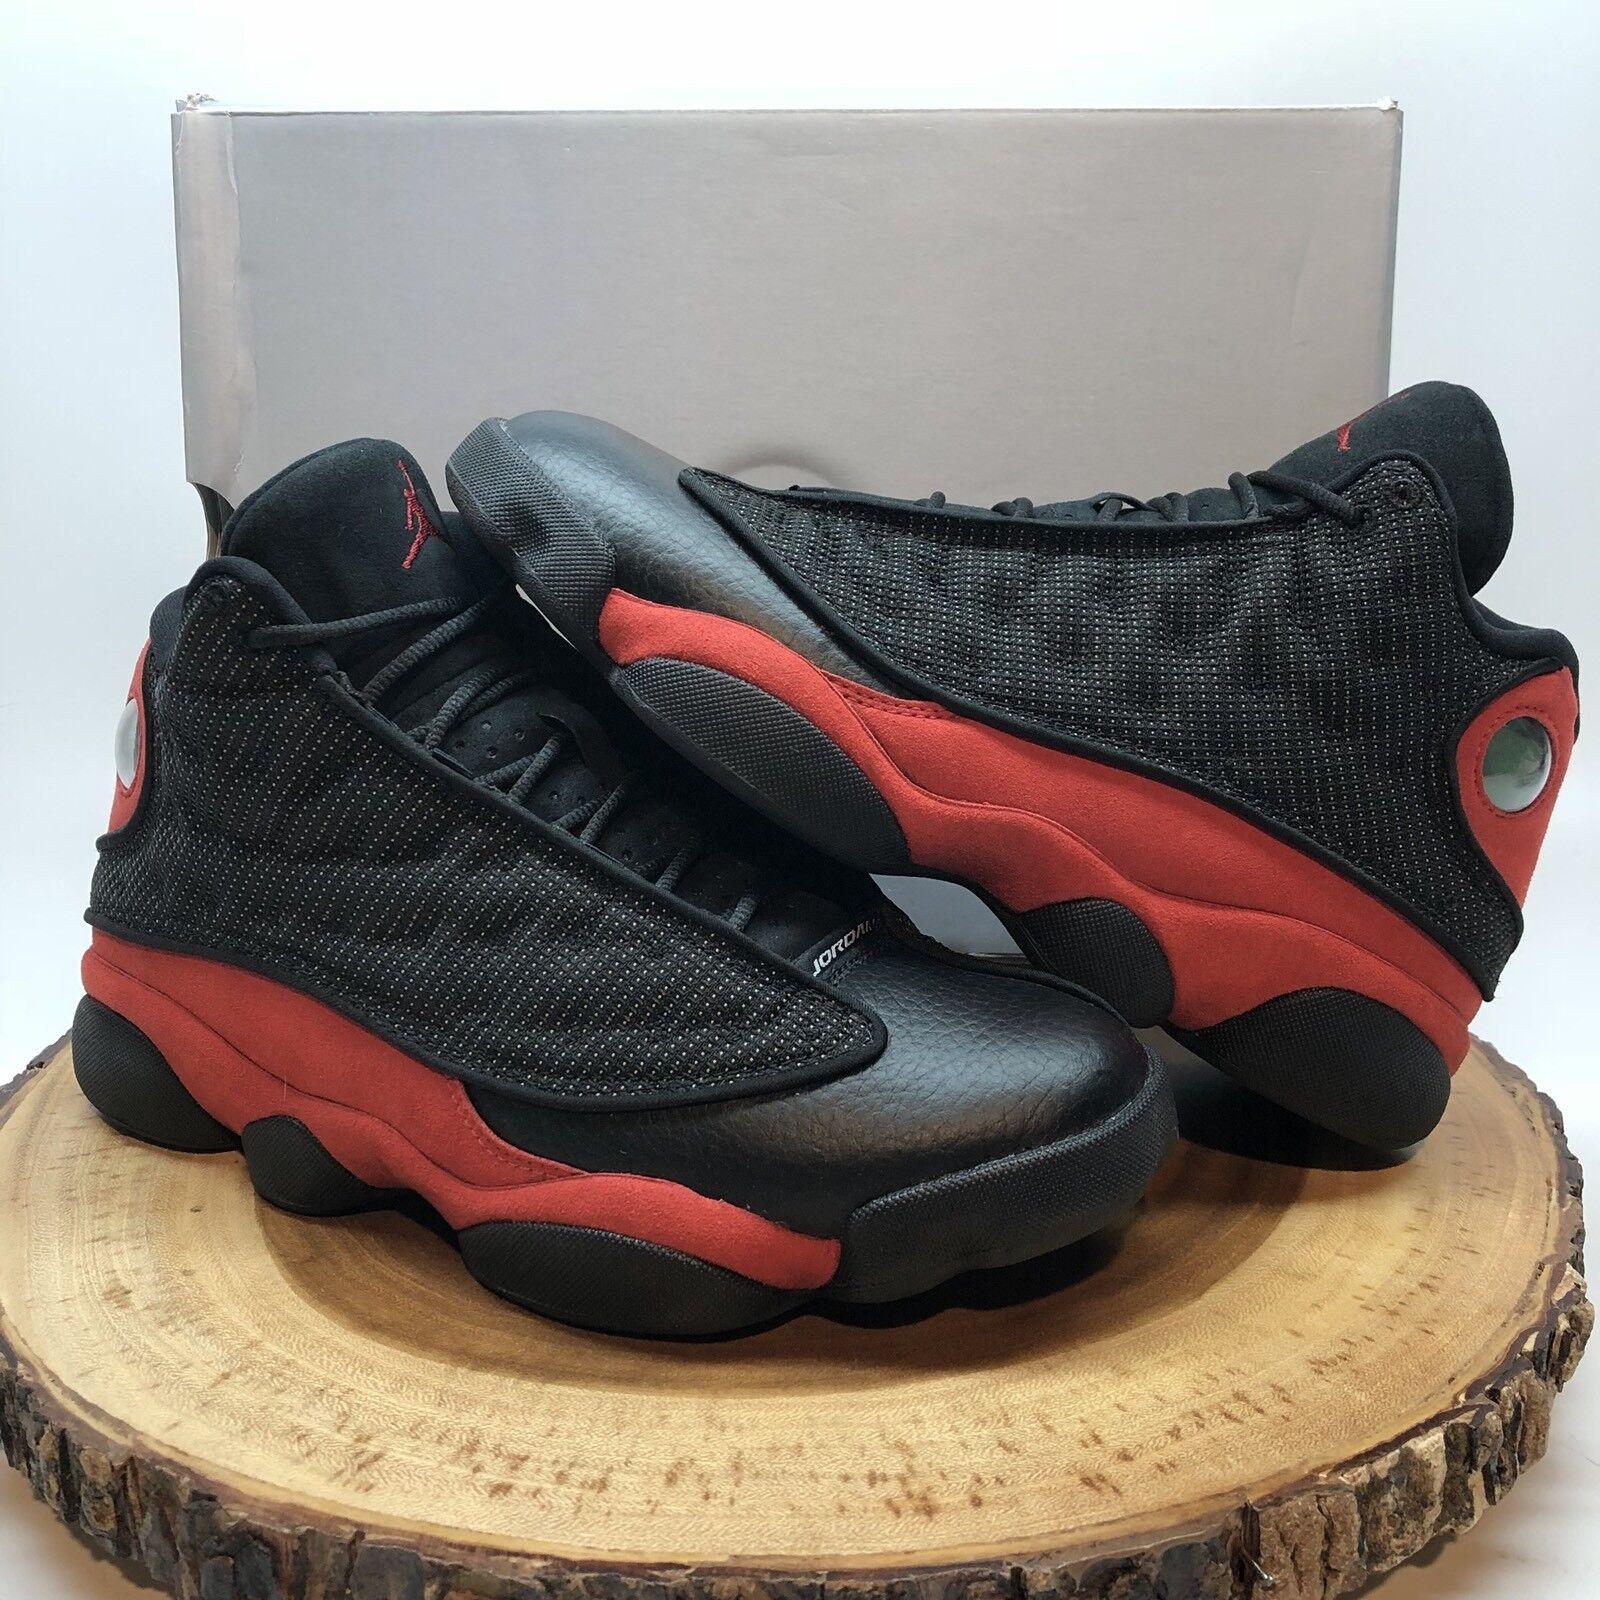 Nike Air Jordan Retro XIII Bred Black Red 3M 414571 004 Comfortable Cheap women's shoes women's shoes